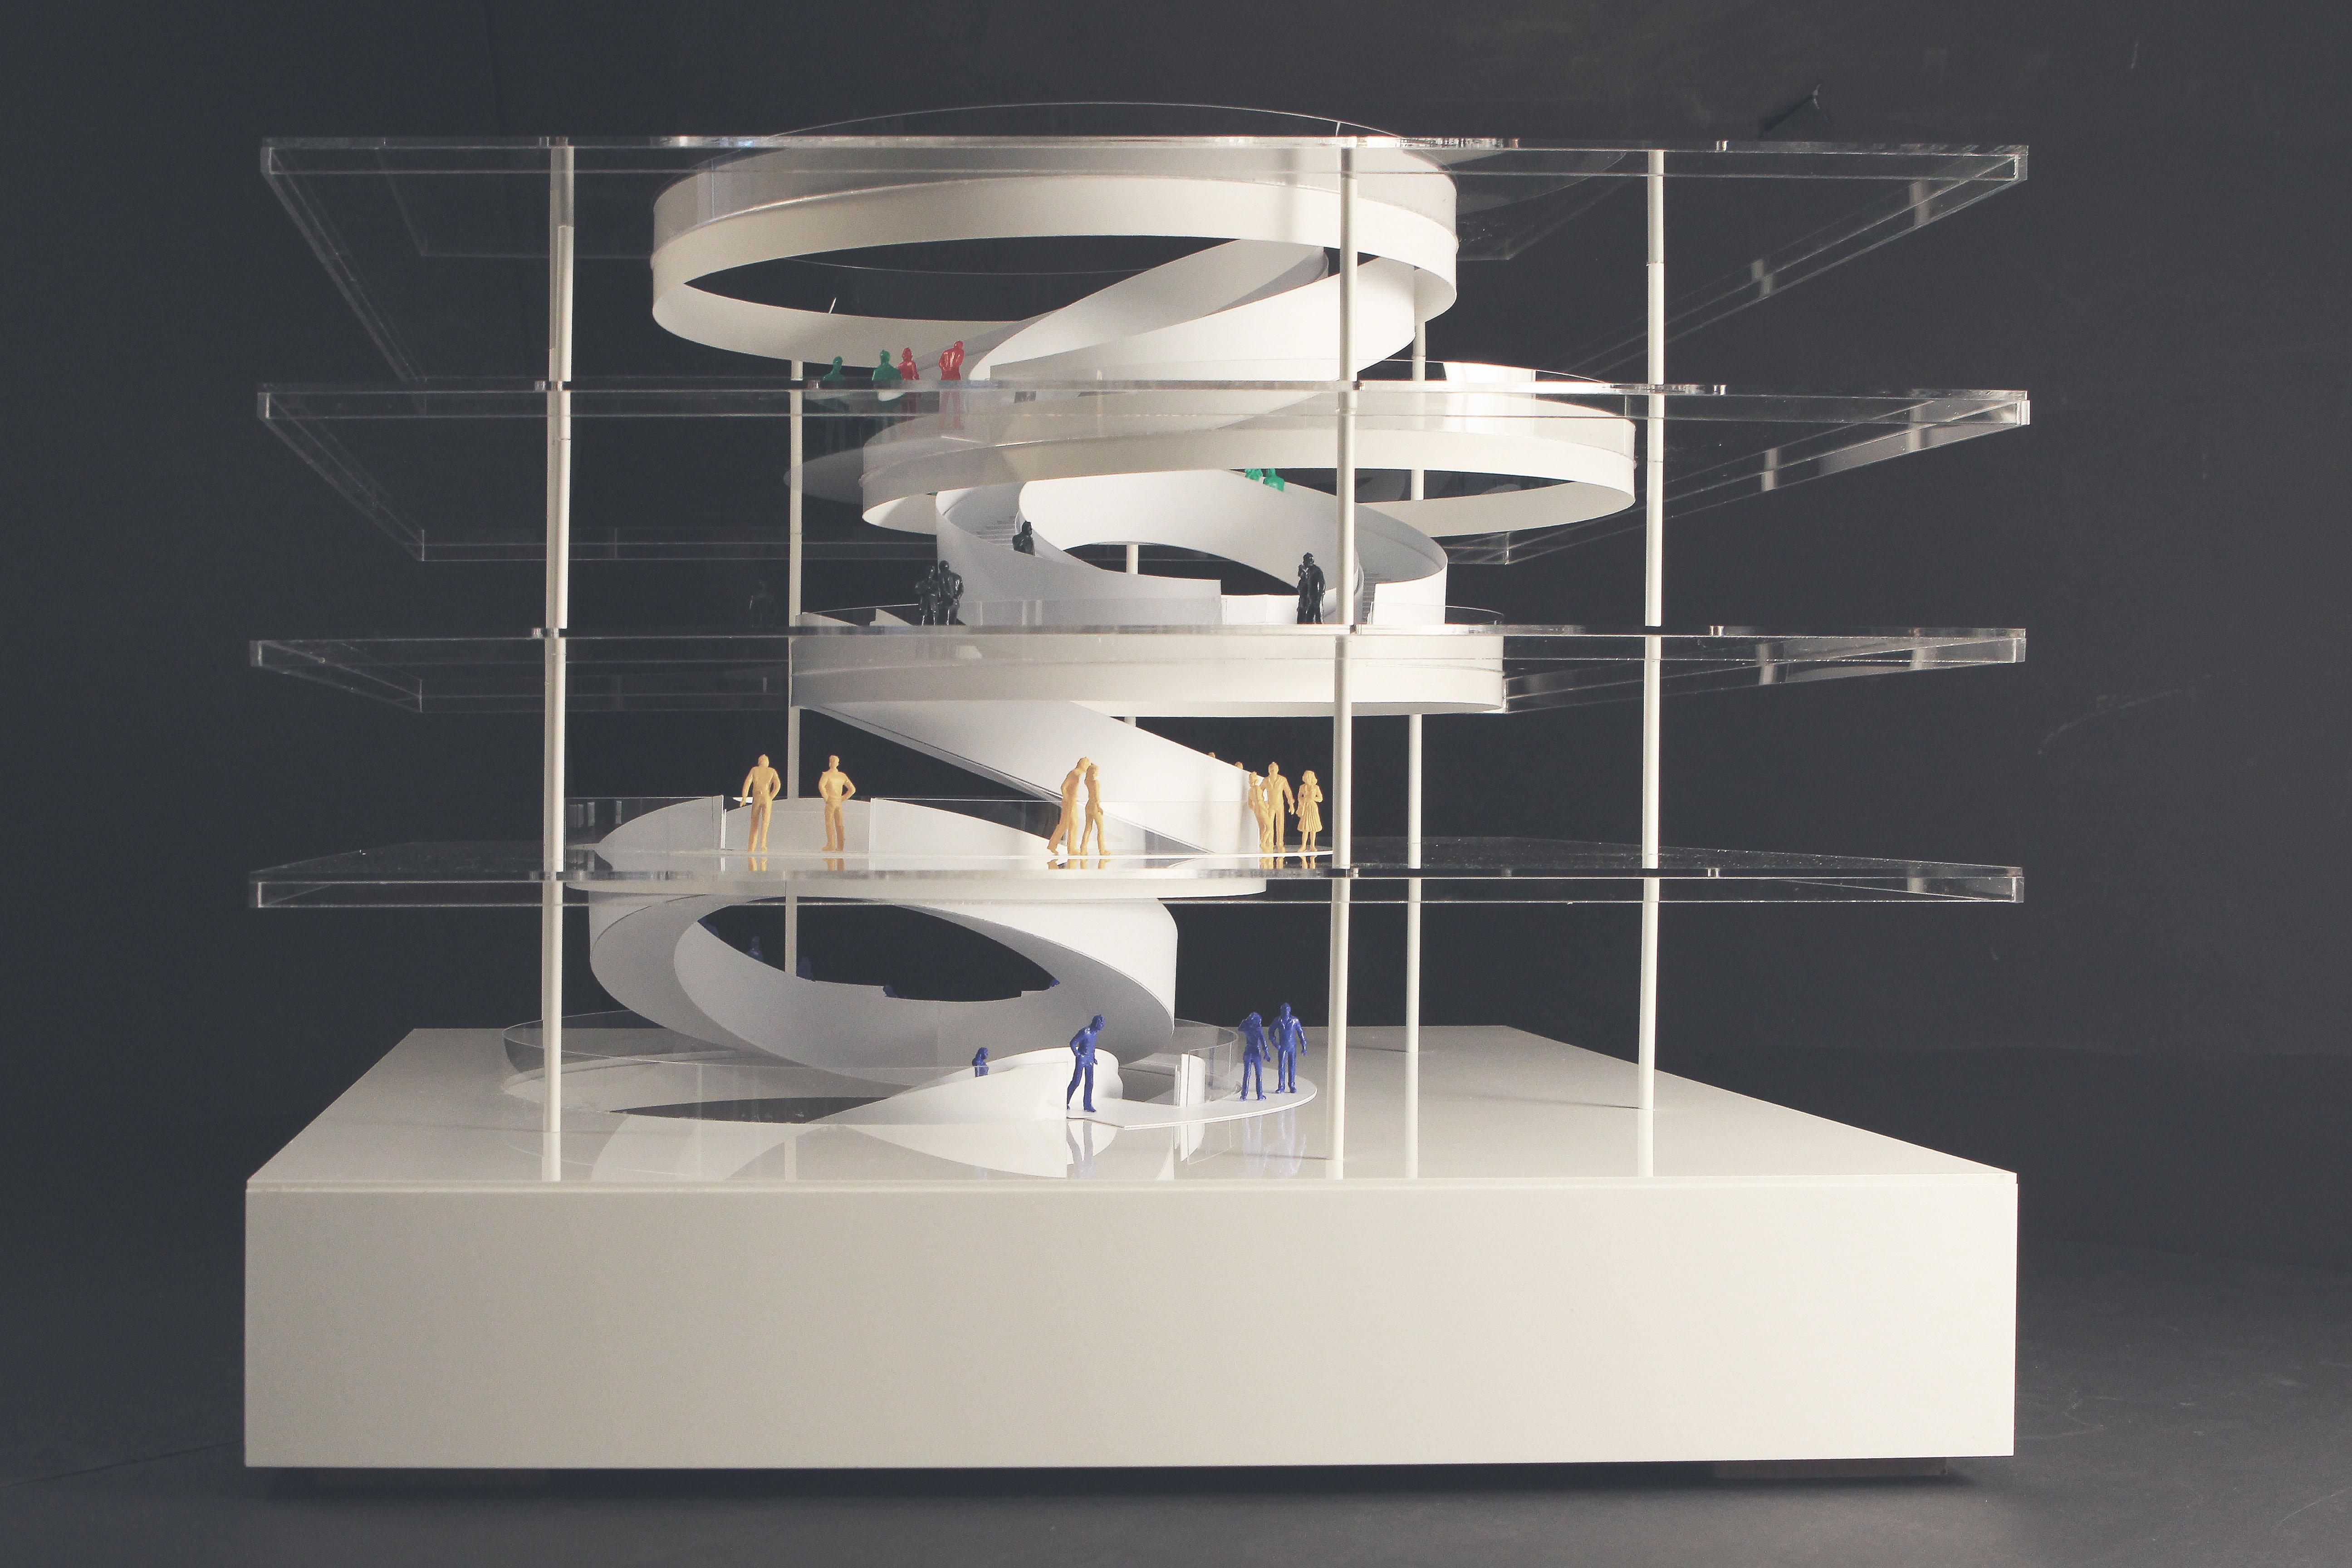 IOC staircase 1:50 model